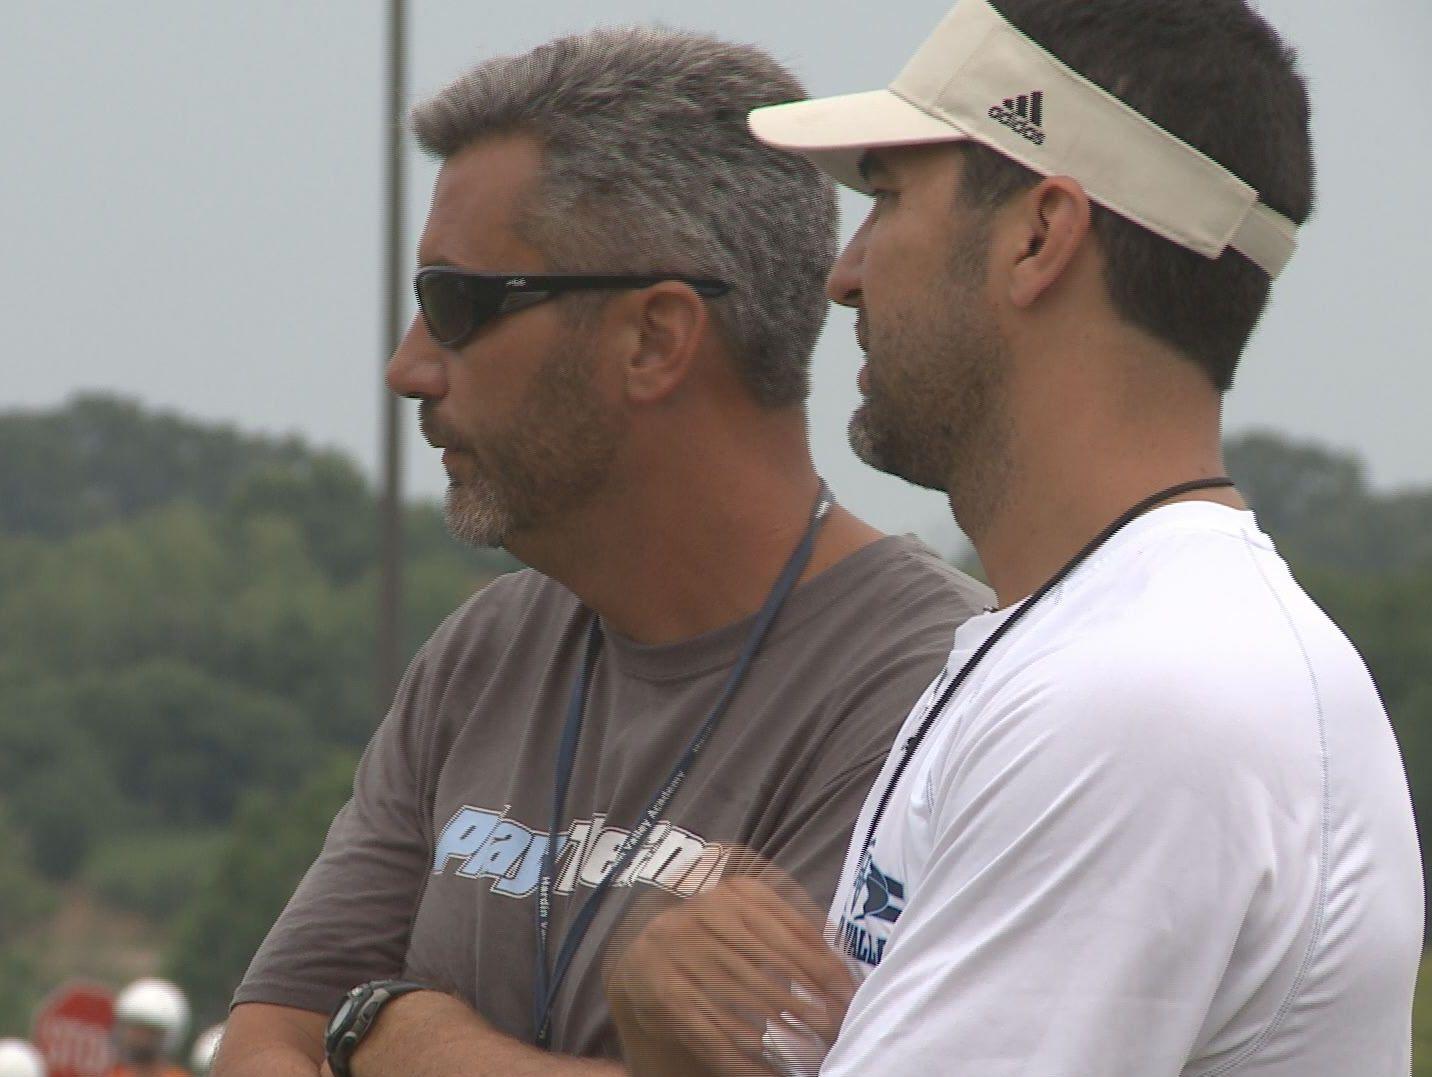 Hardin Valley head coach Wes Jones looks on as his team practices.